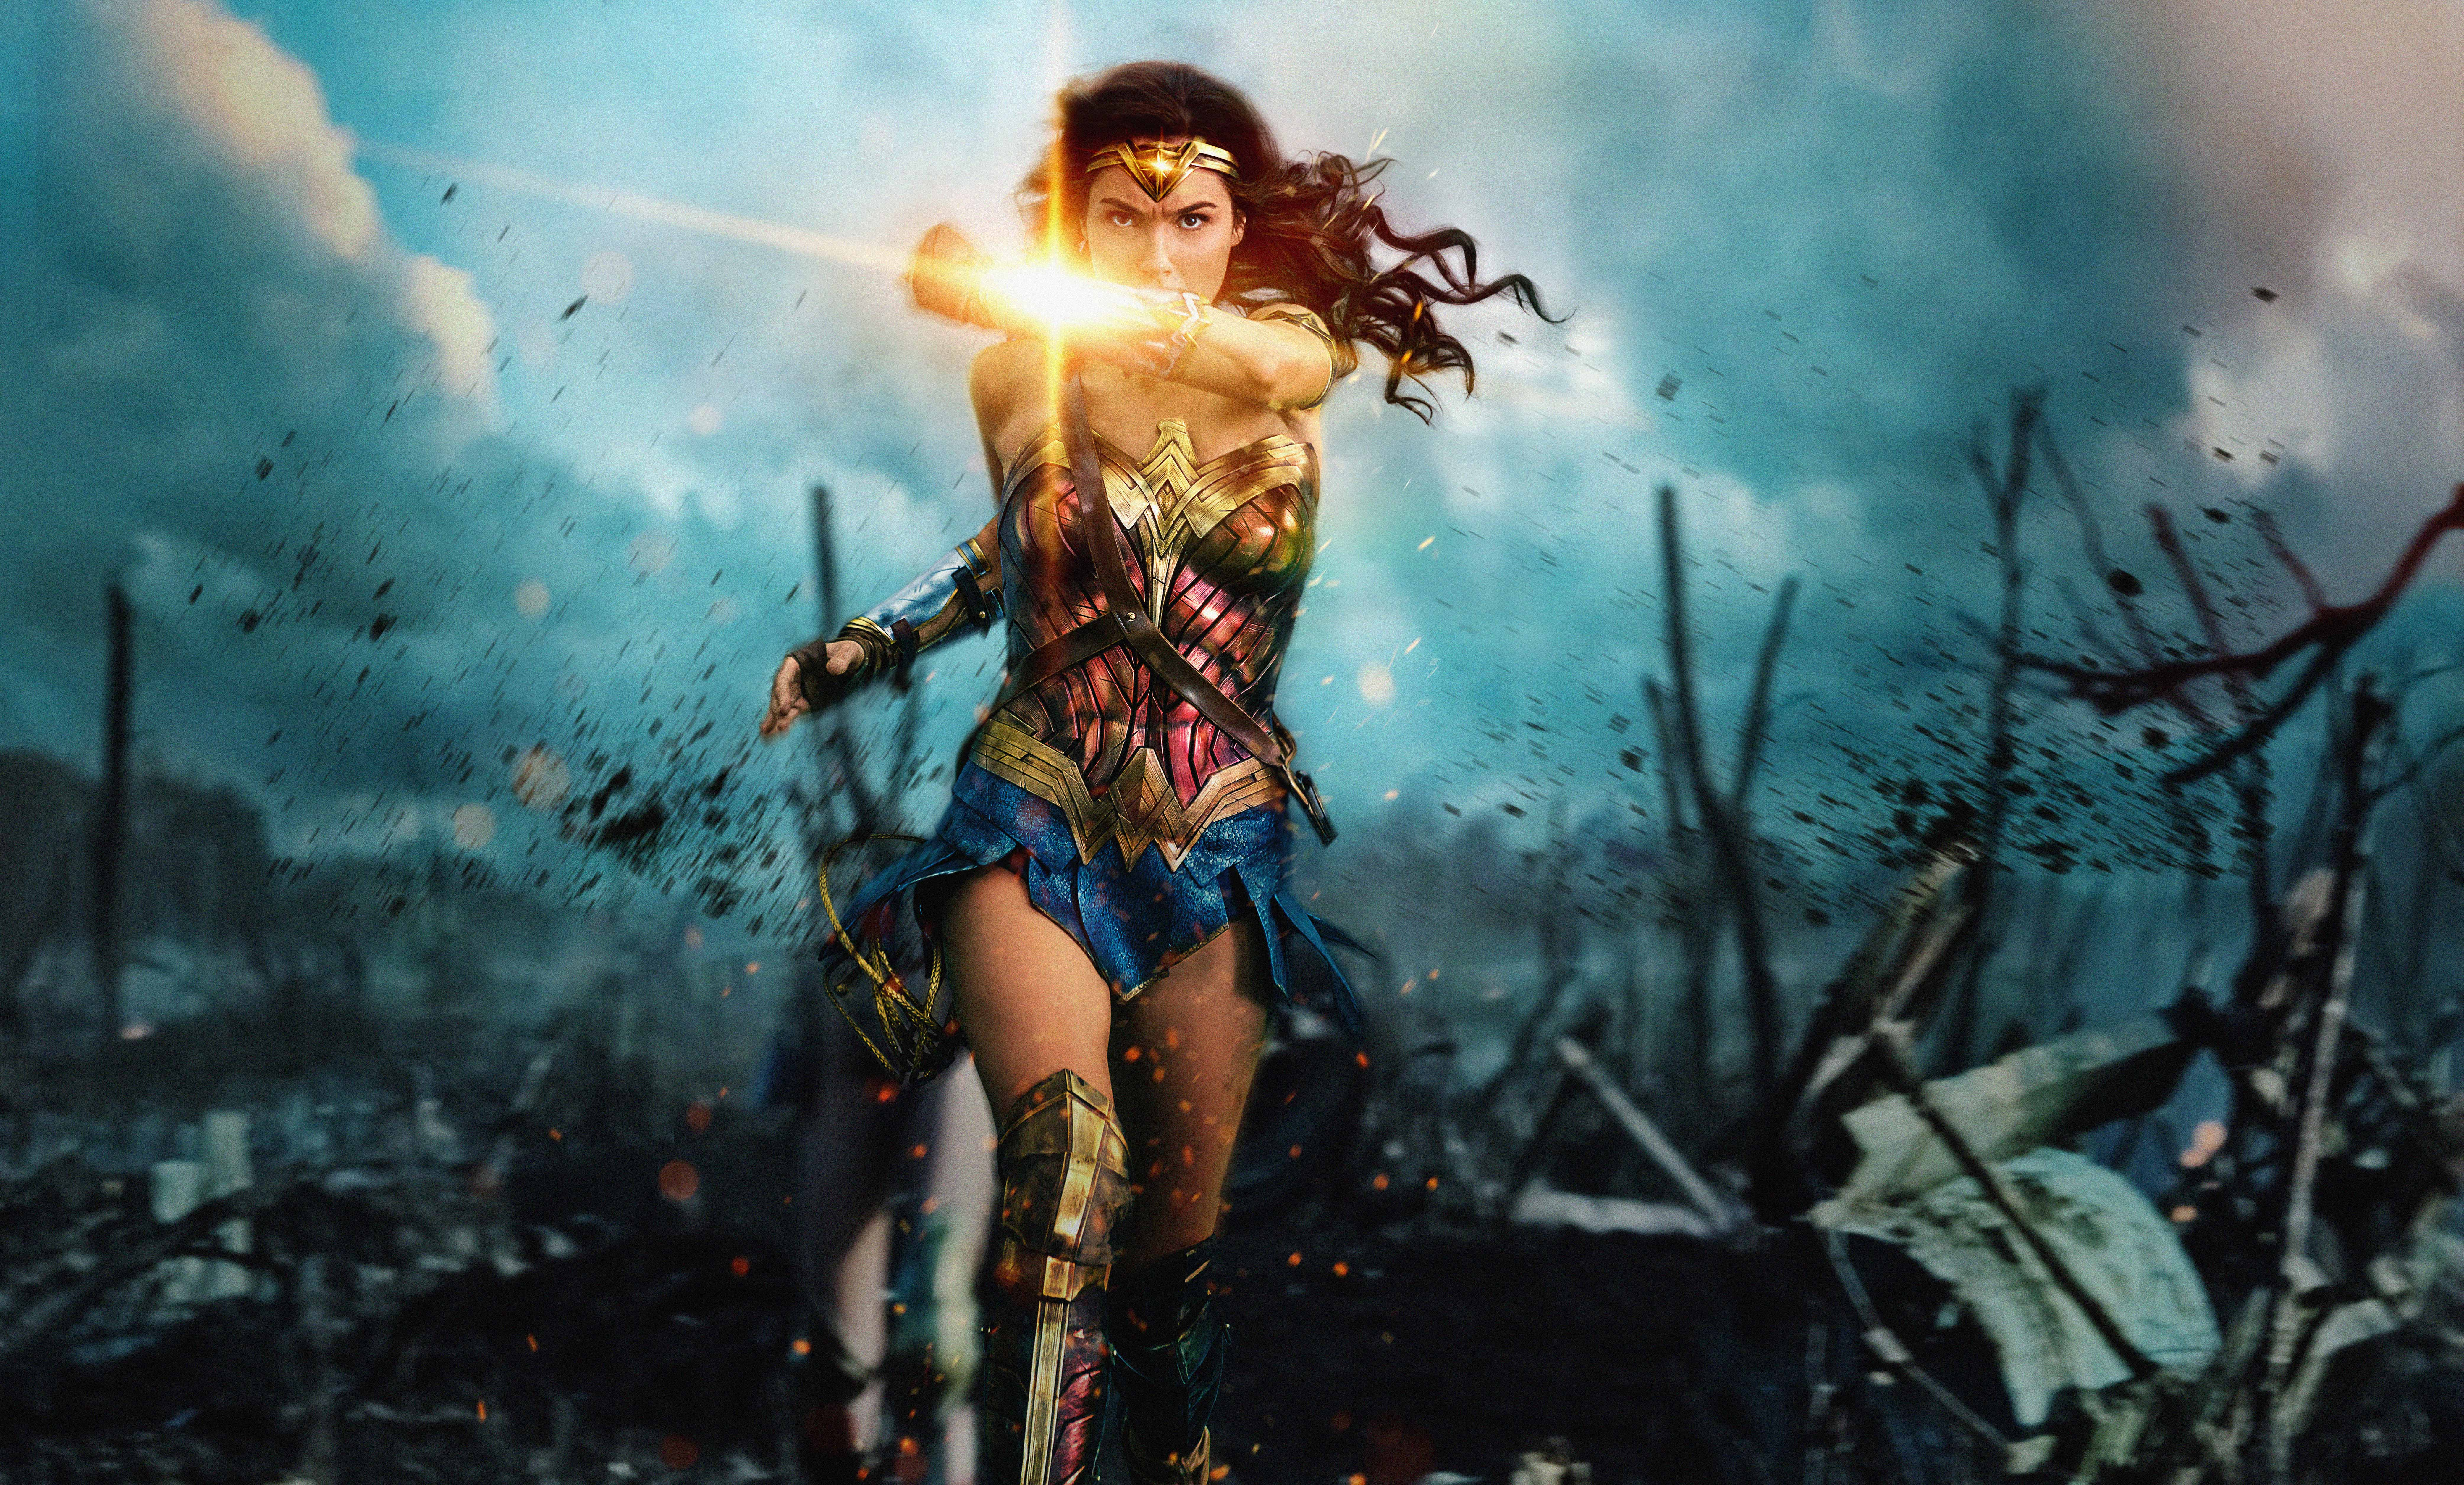 7680x4320 Wonder Woman 8k 2017 8k Hd 4k Wallpapers Images